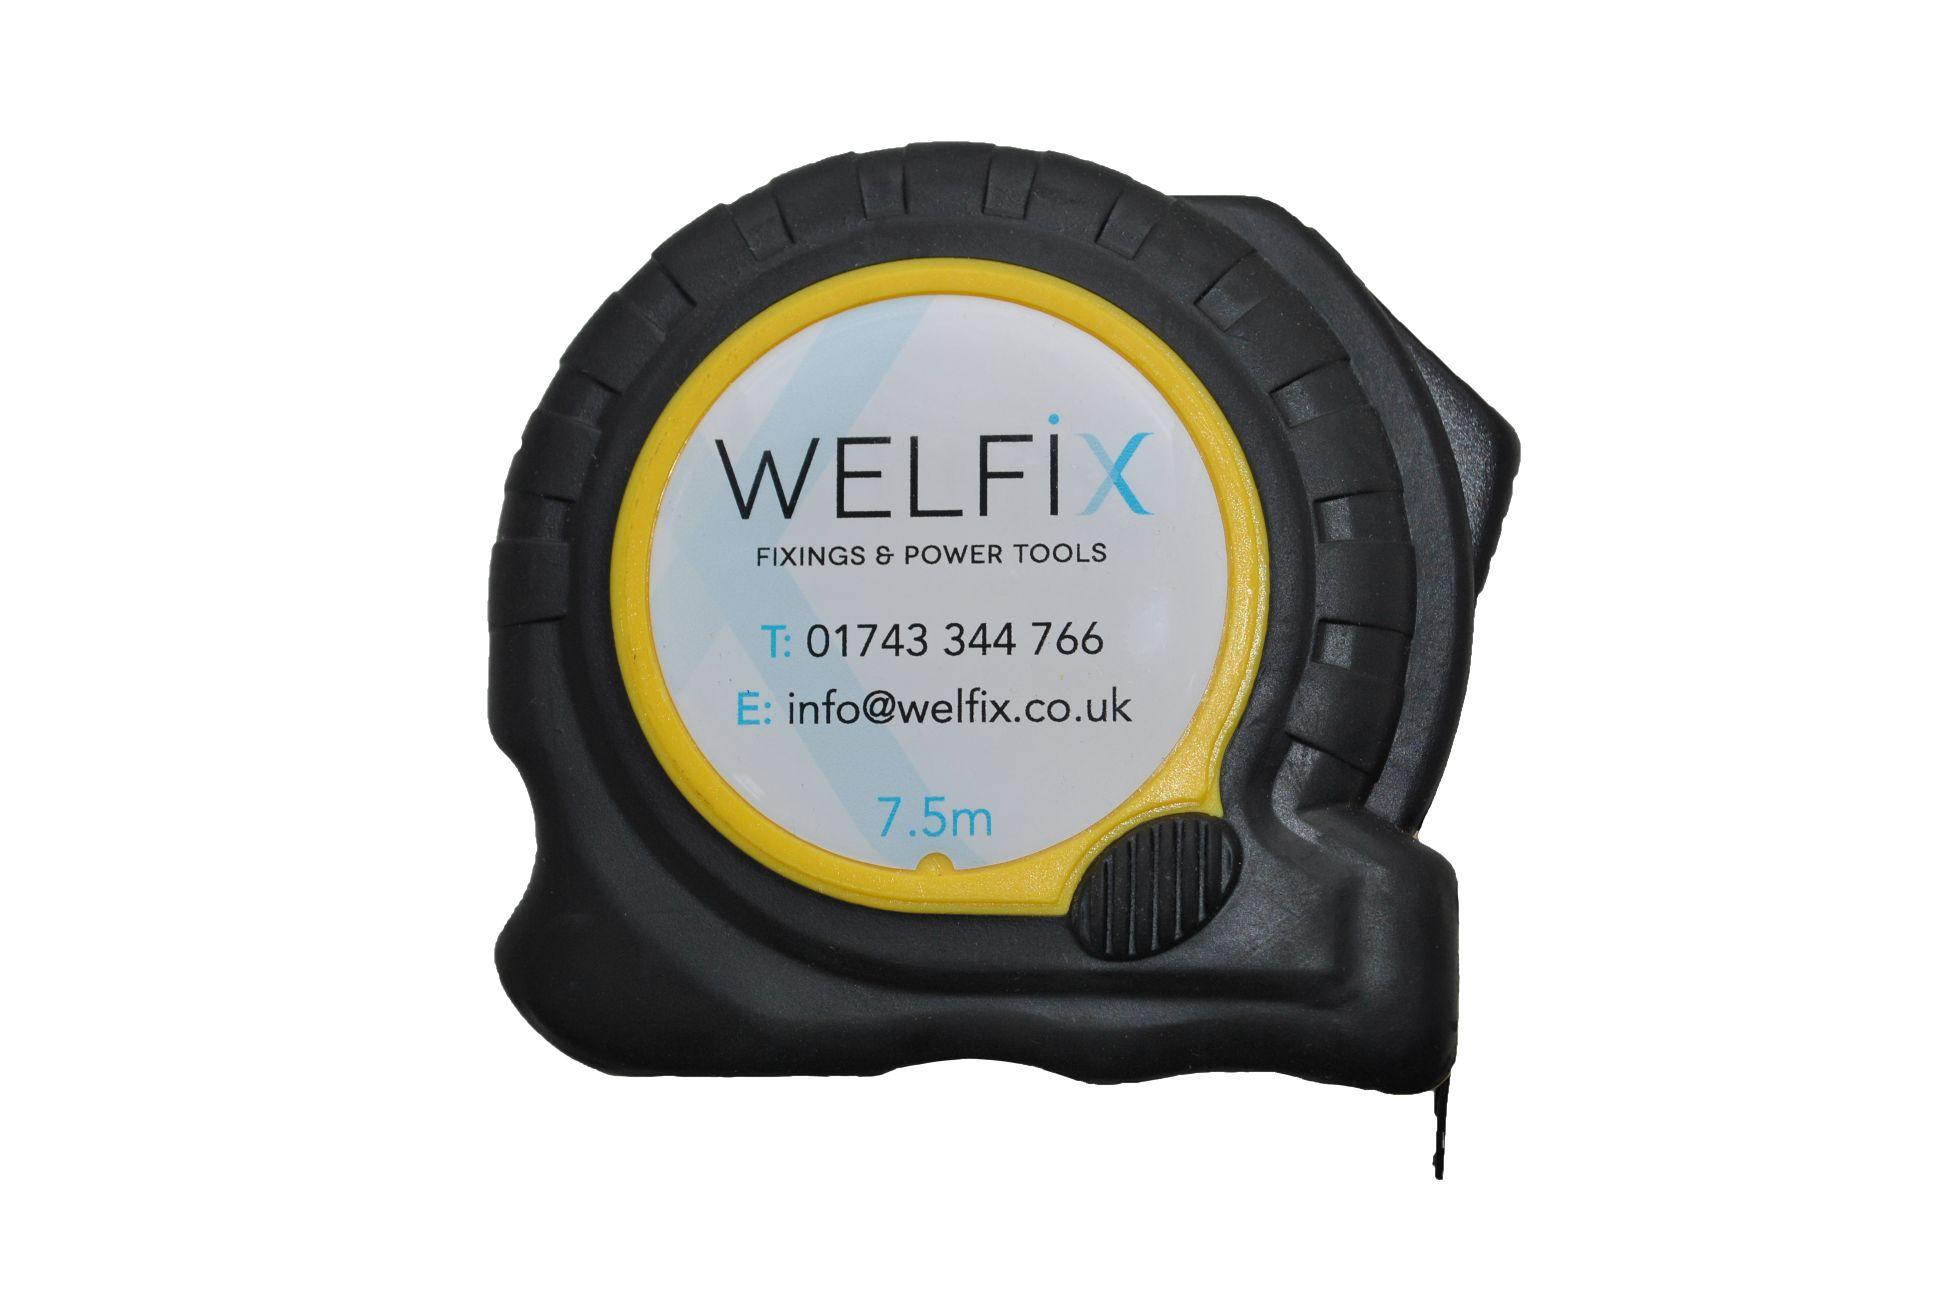 'WELFIX' TAPE MEASURE -  7.5M/25FT